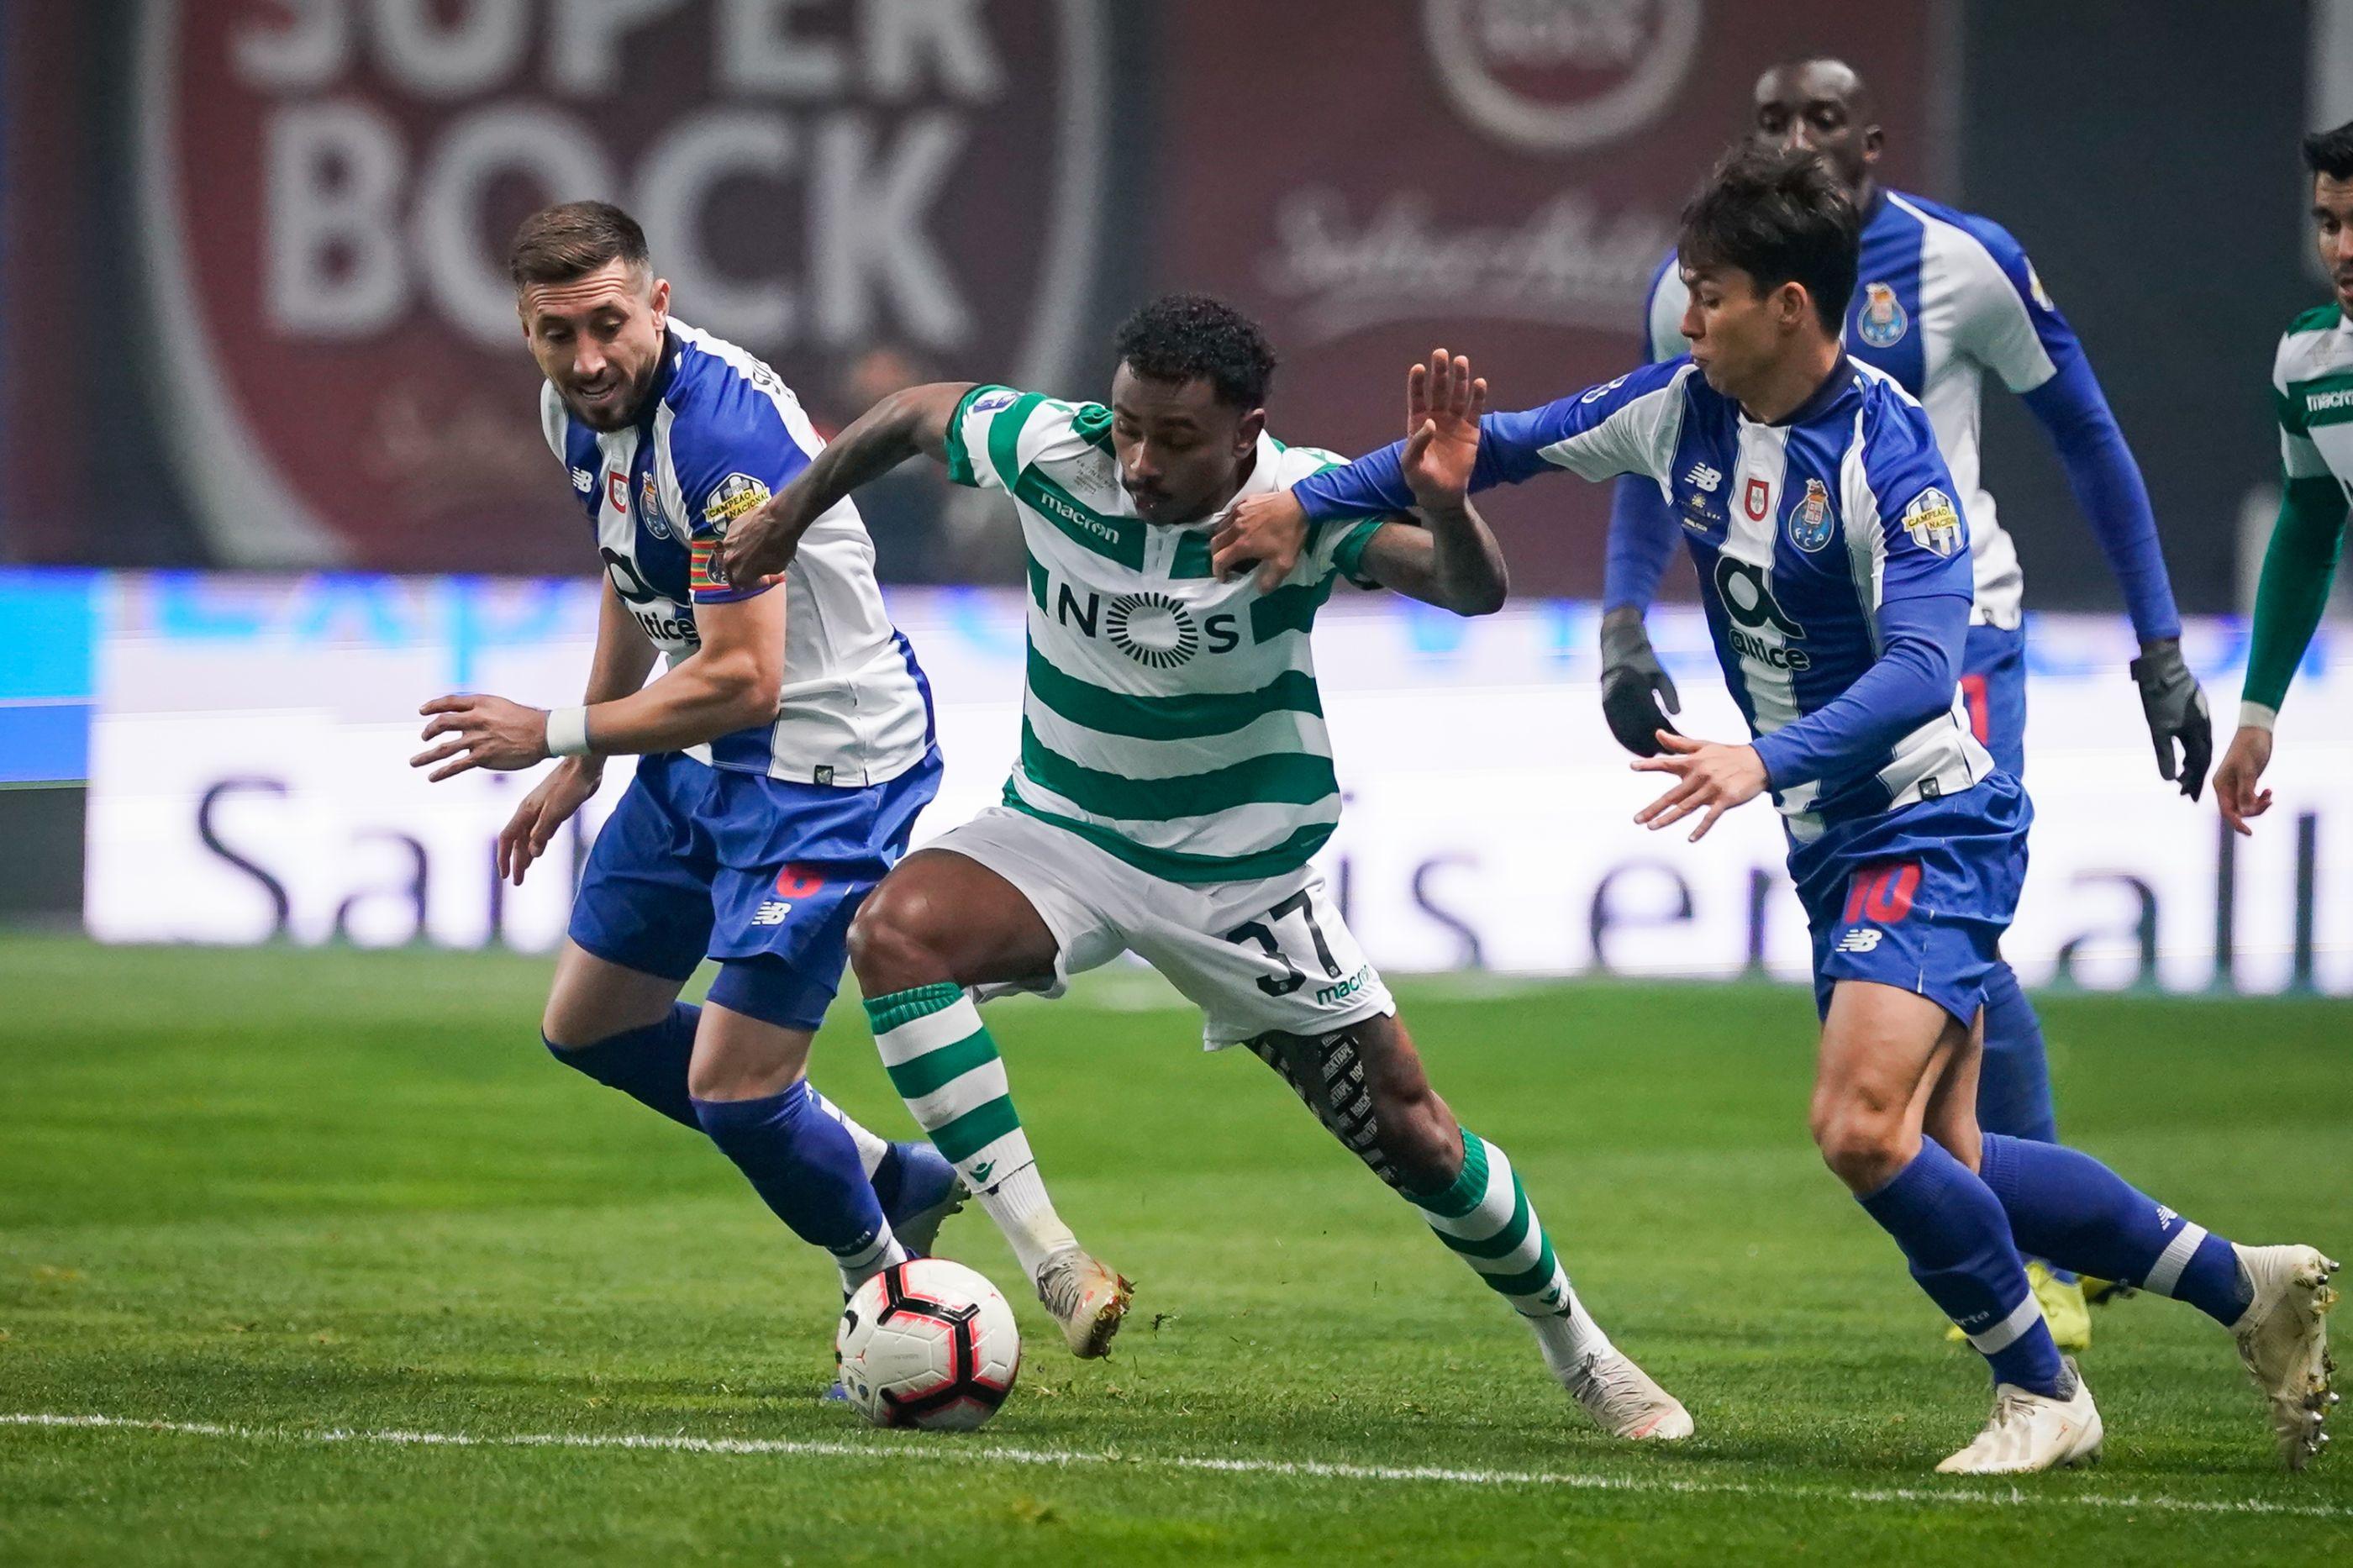 [0-0] Intervalo no FC Porto-Sporting: Nulo mantém-se